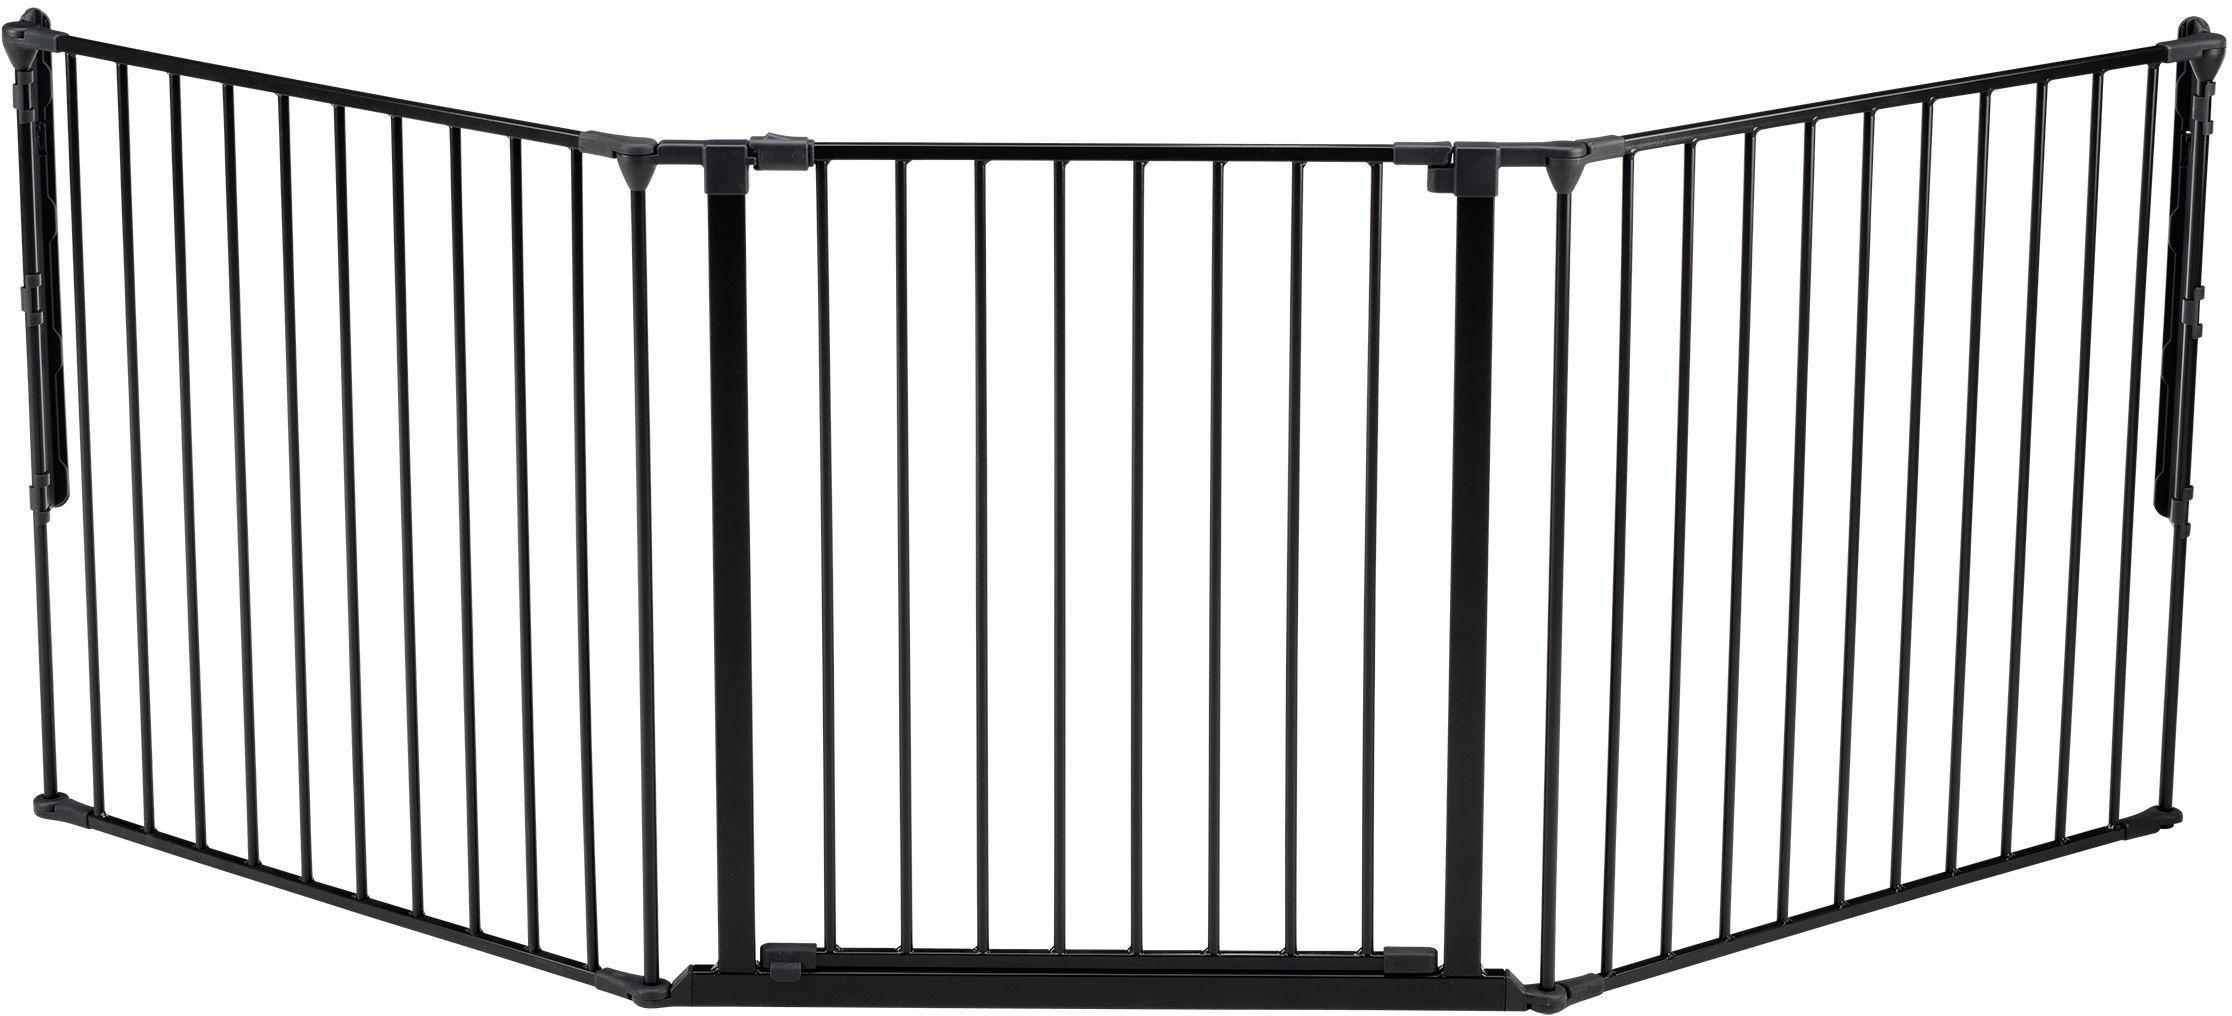 BabyDan - Large Configure Gate - Black